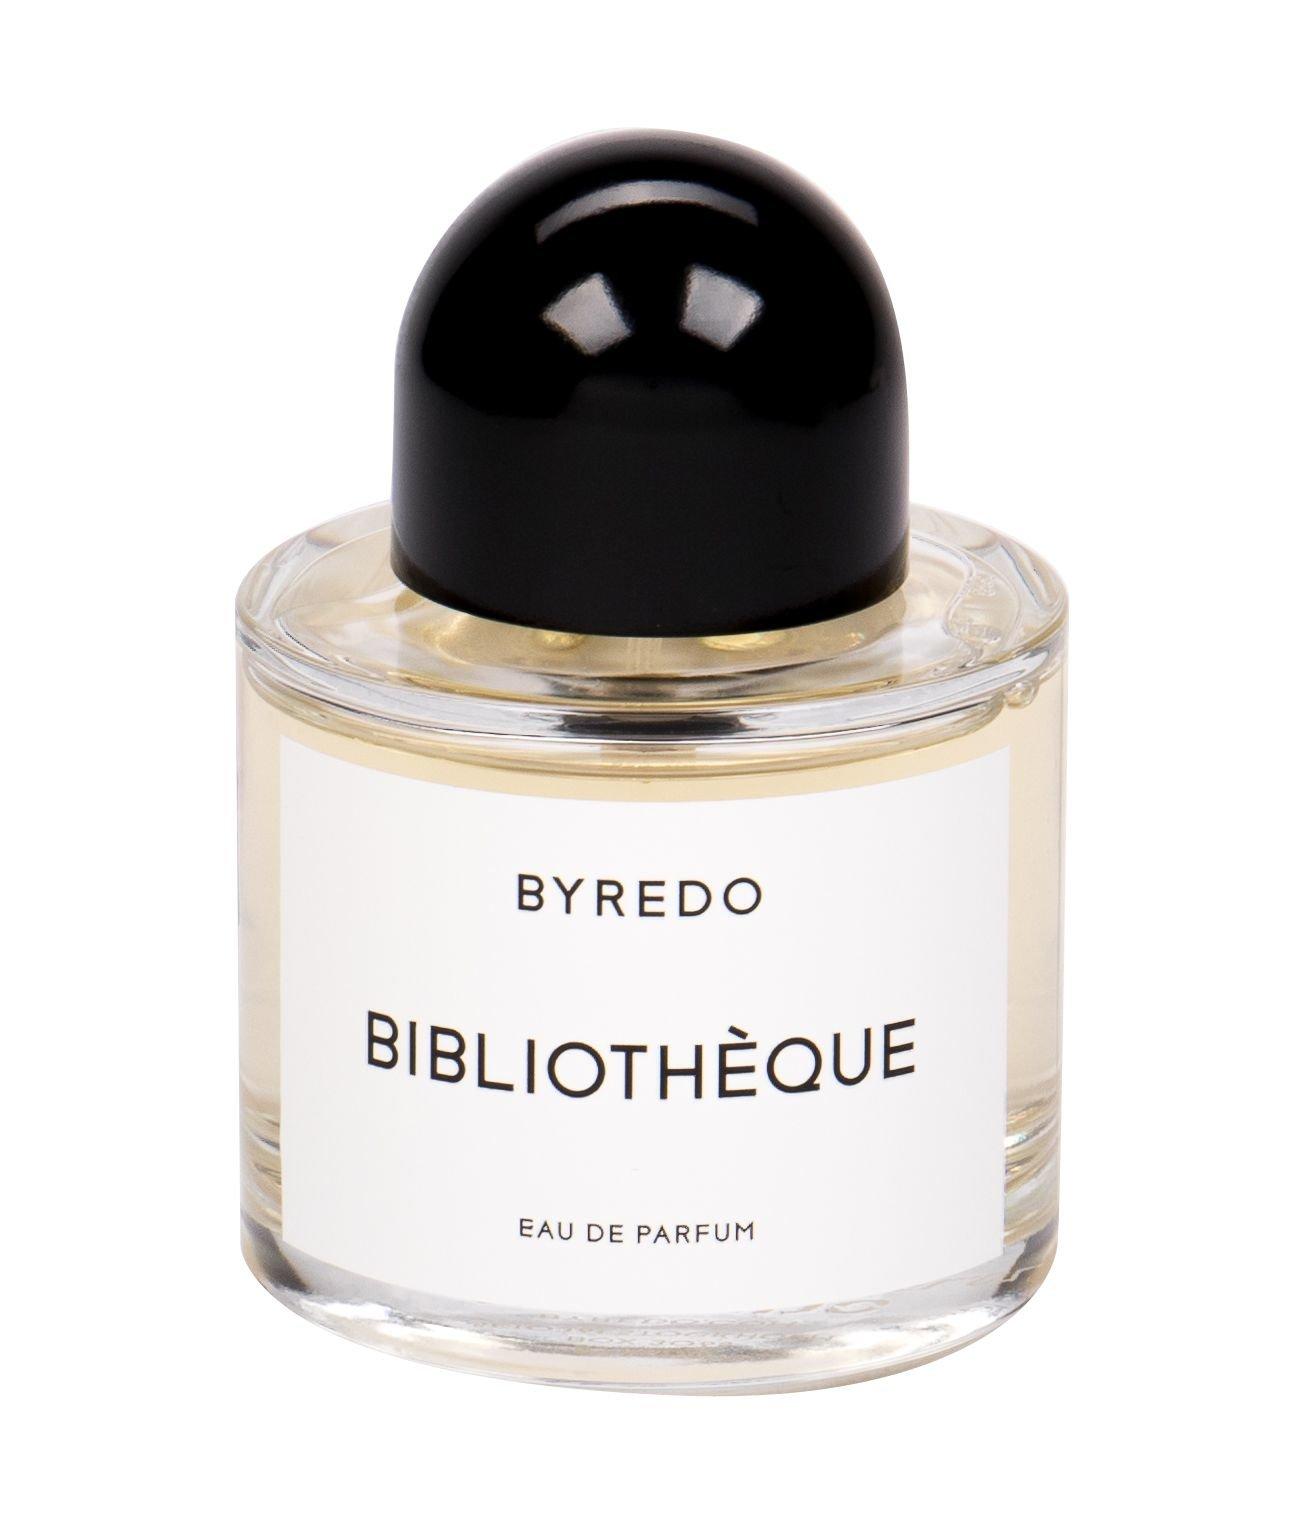 BYREDO Bibliotheque Eau de Parfum 100ml